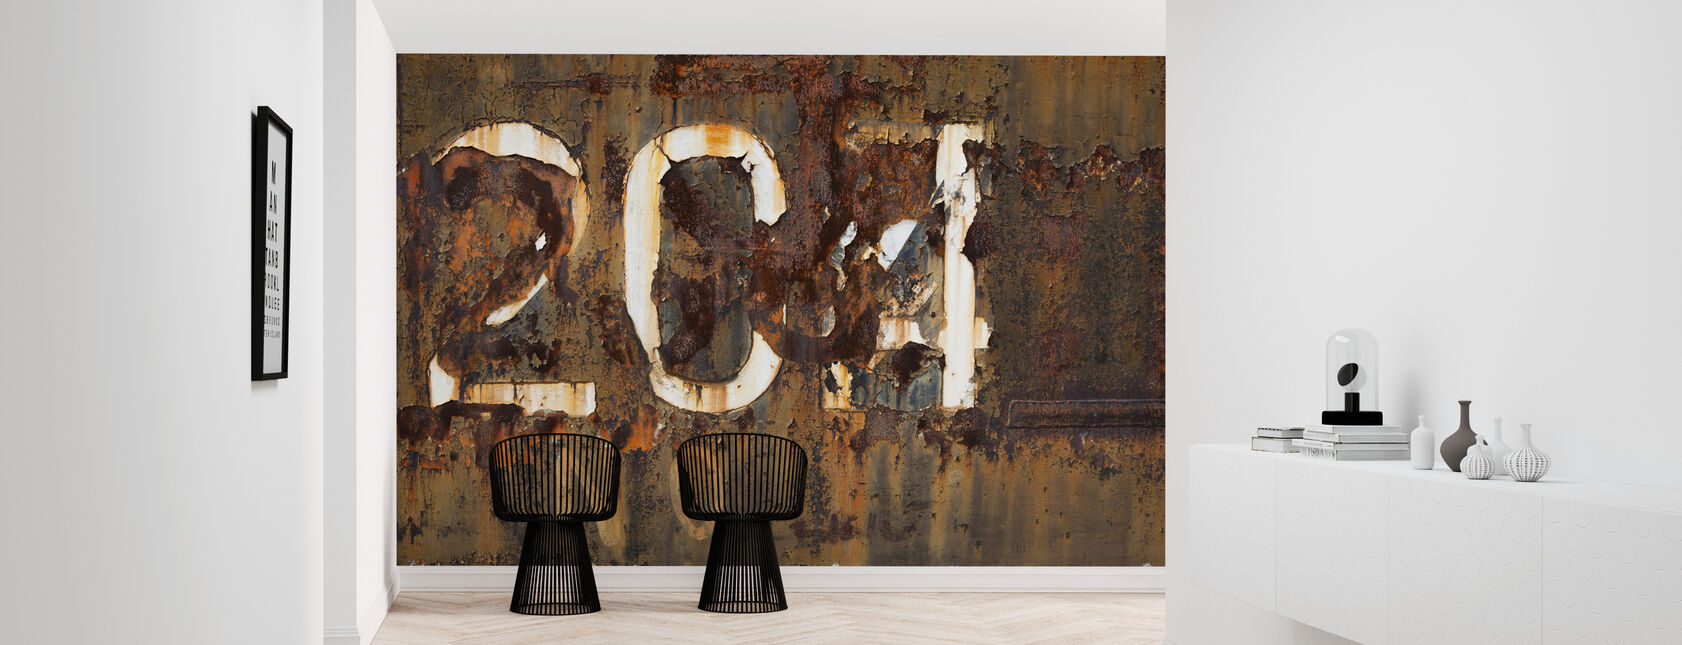 Rusty Old Surface - Wallpaper - Hallway